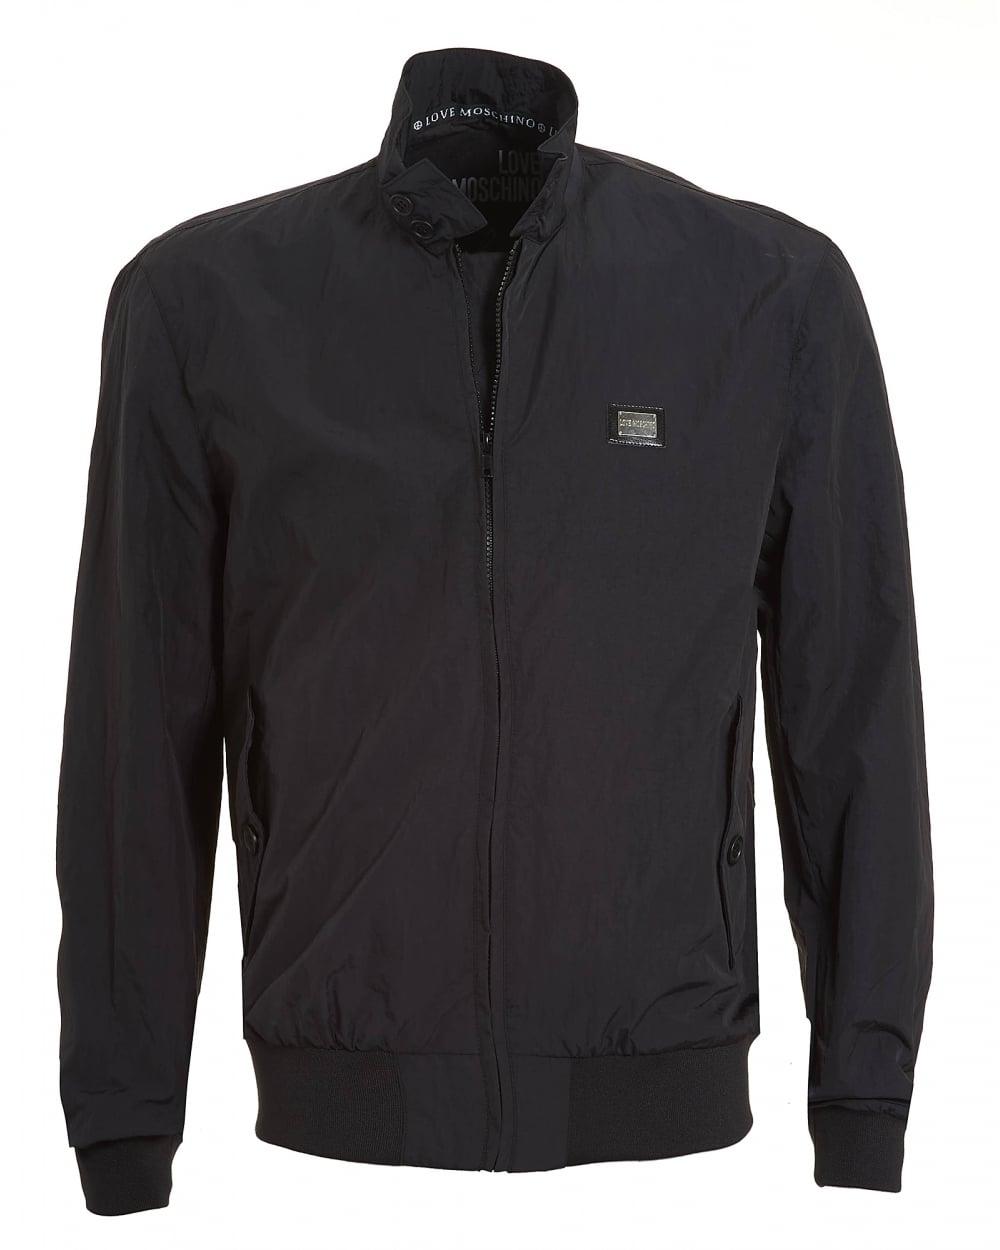 b944df60b56ec Love Moschino Mens Harrington Jacket, Zip Through Black Coat